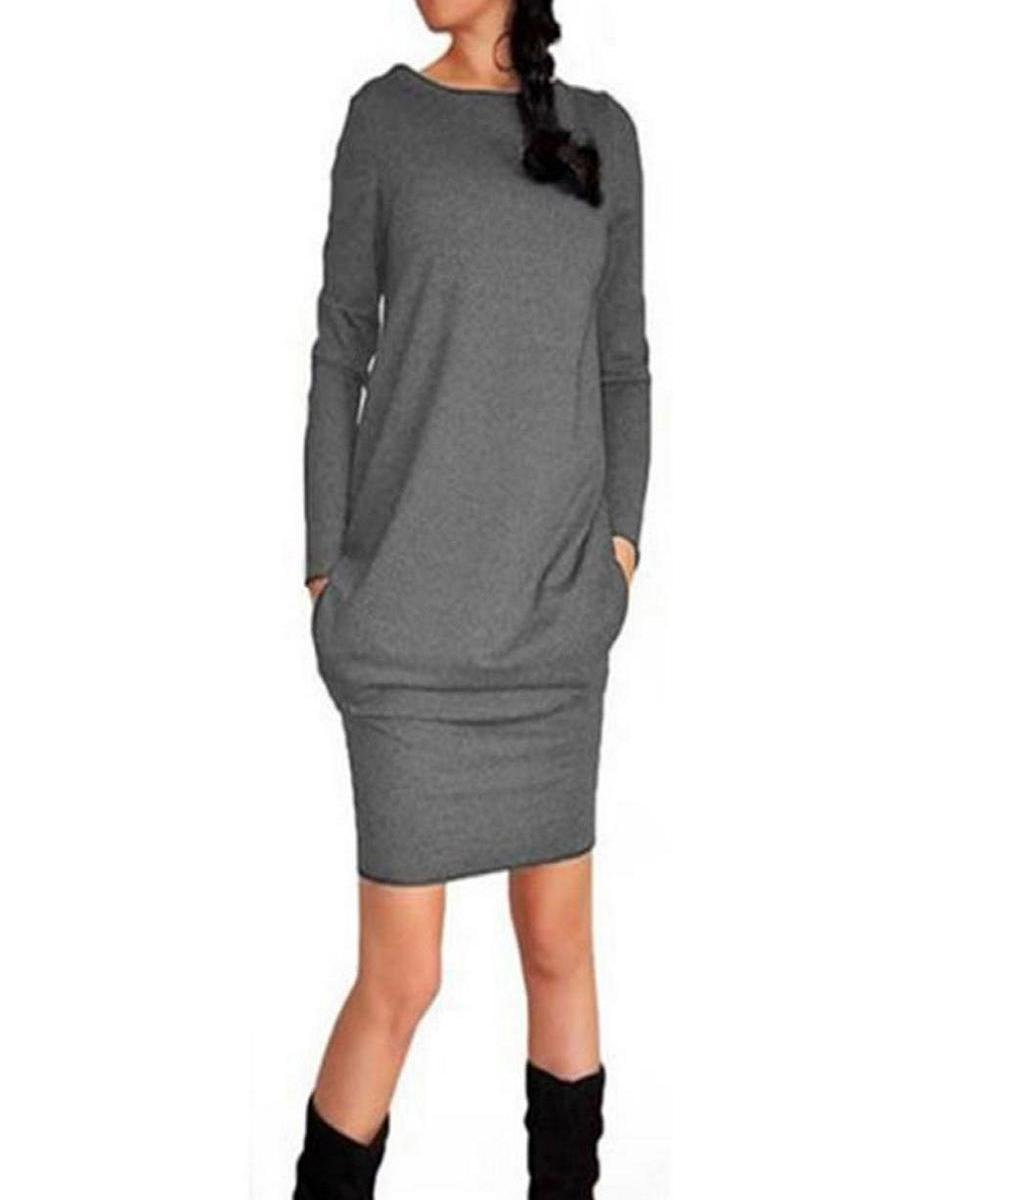 Rcool Damen neue trendige Polyester O-Ausschnitt Röcke Casual Herbst Winter  Paket Hip Kleid: Amazon.de: Bekleidung